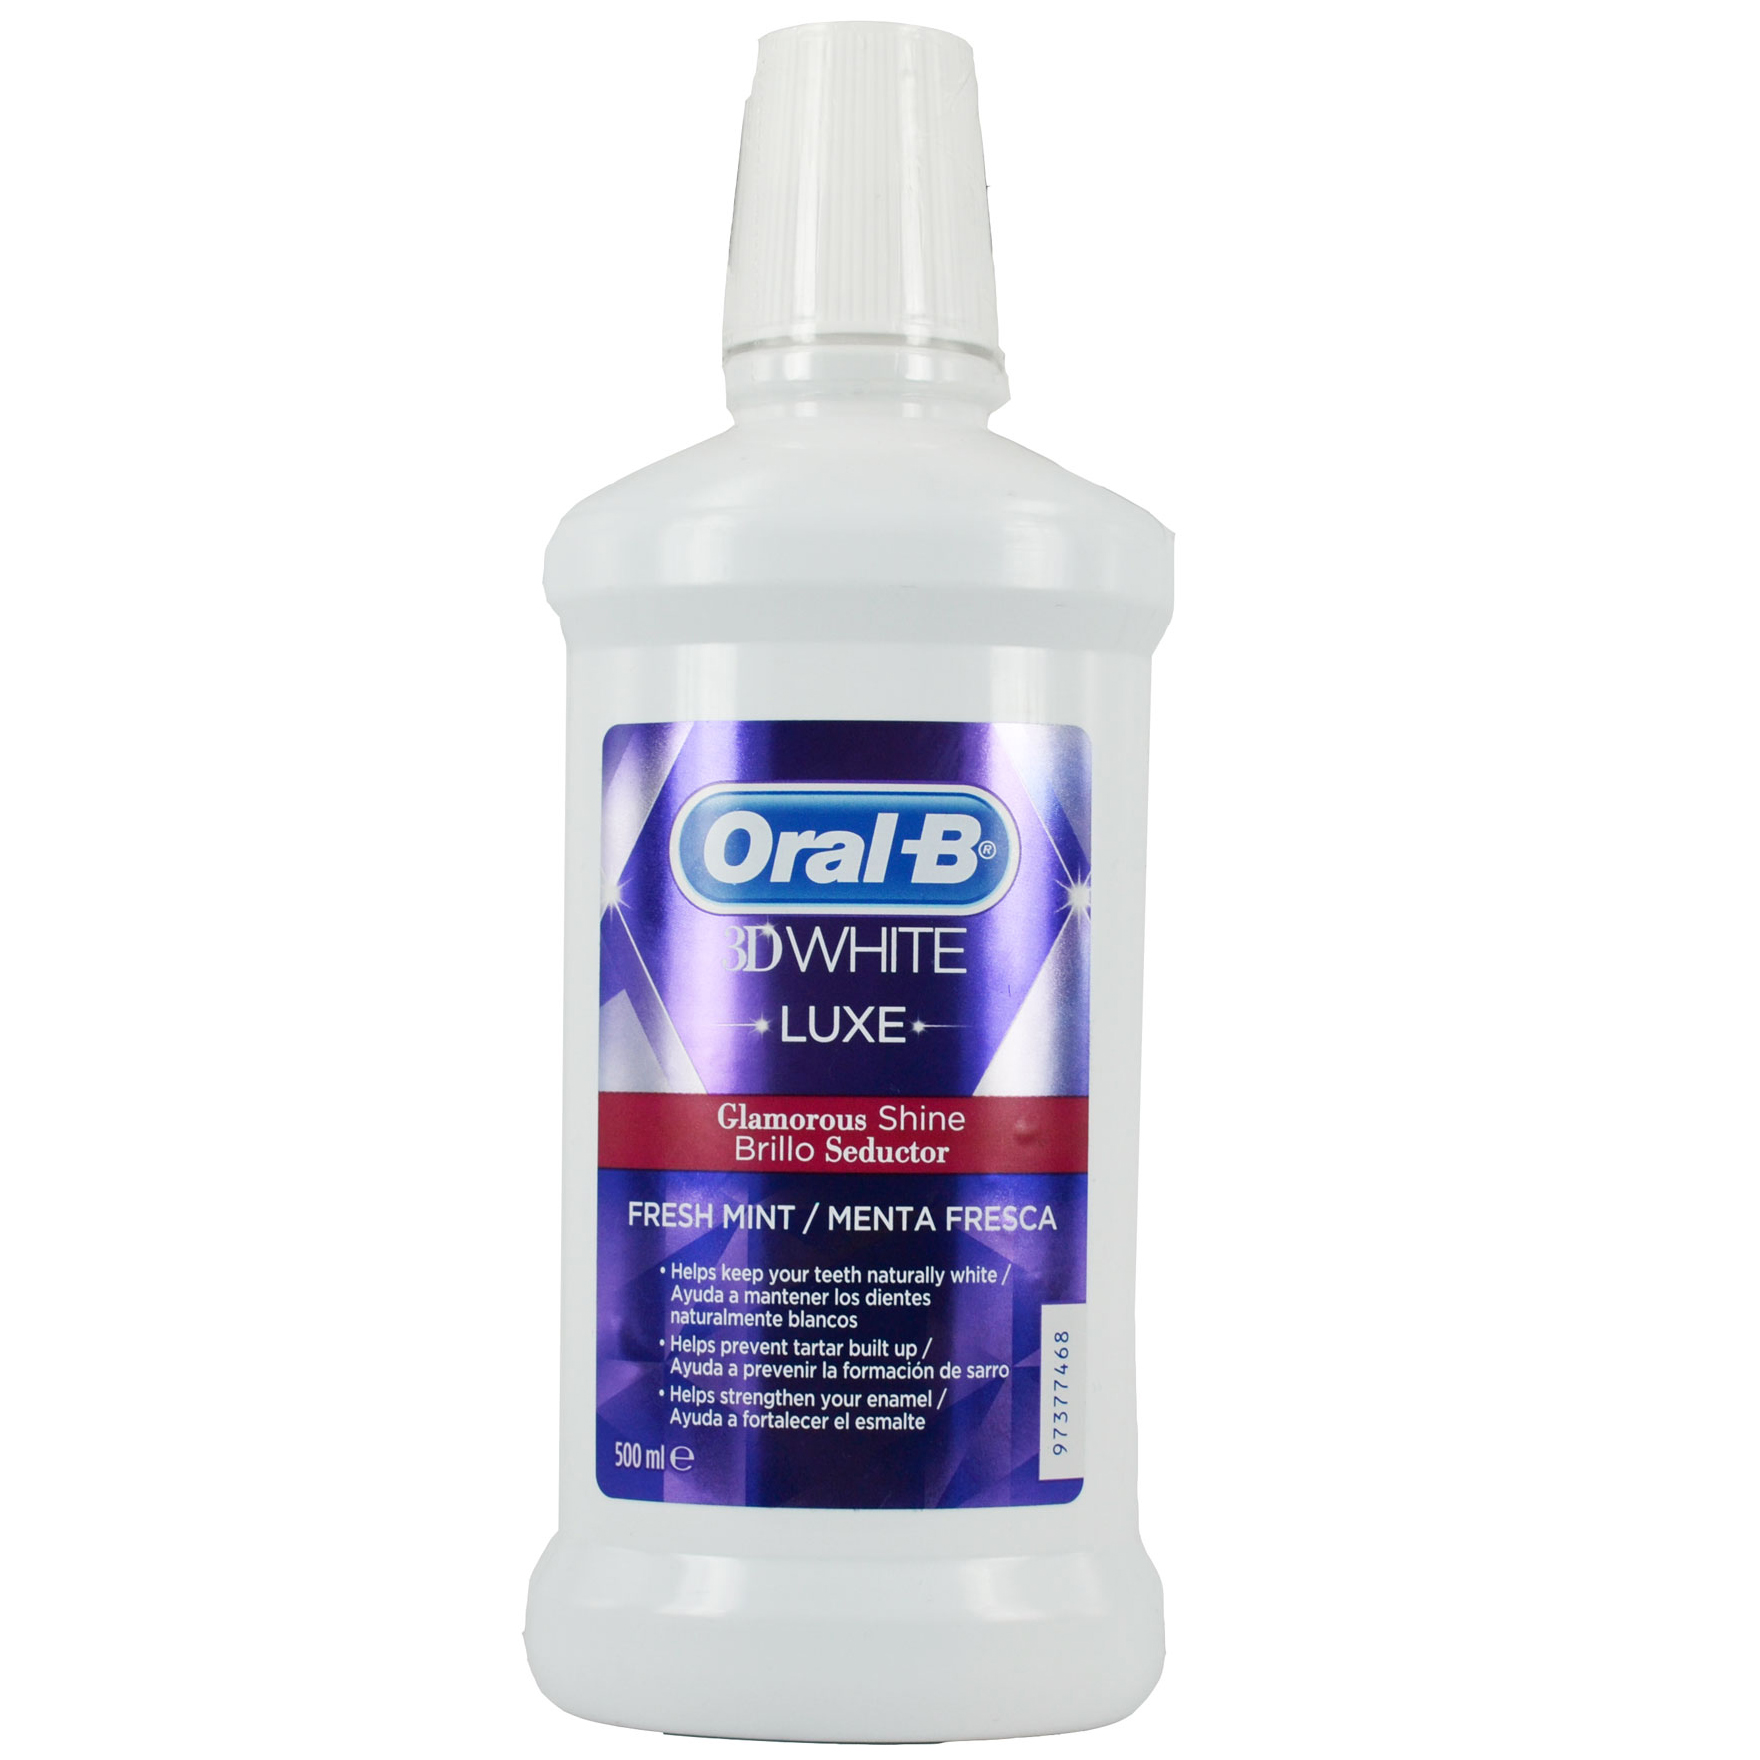 Oral-B 3D White Luxe Glamorous Shine Στοματικό Διάλυμα για Λευκά Δόντια με Άρωμα Μέντας 500ml